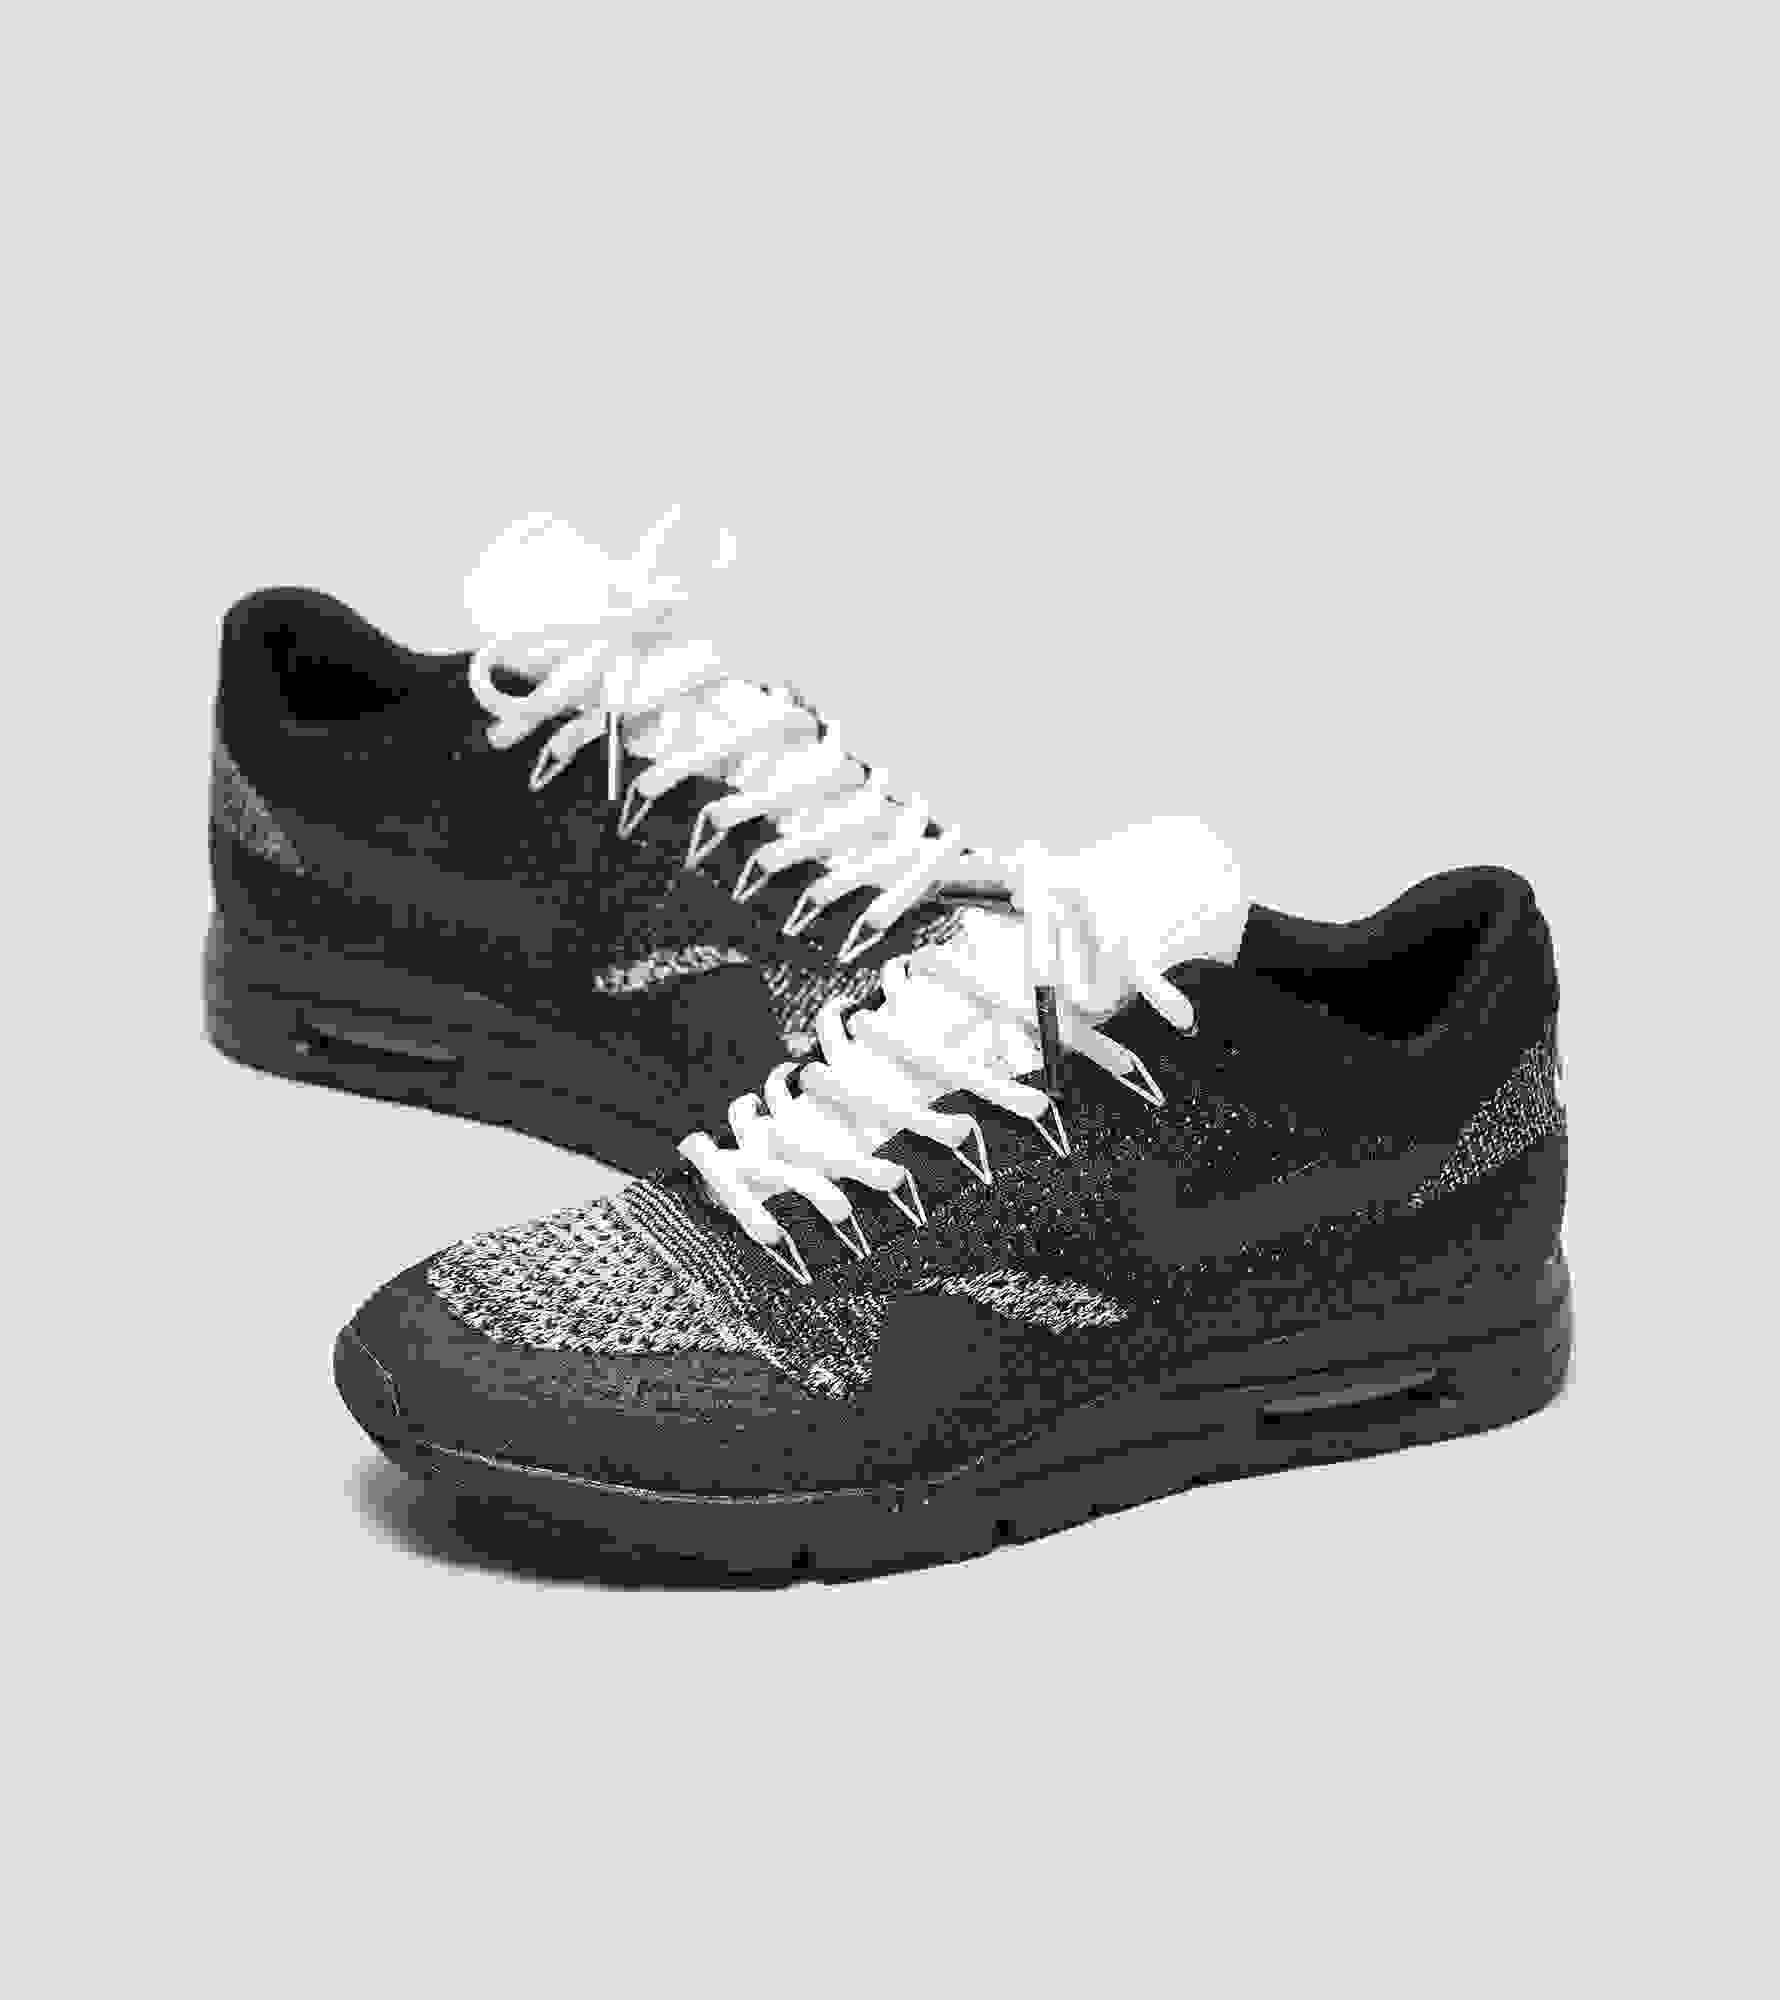 Nike Max Uptempo 97 Air Max Uptempo 95  60933f9a8